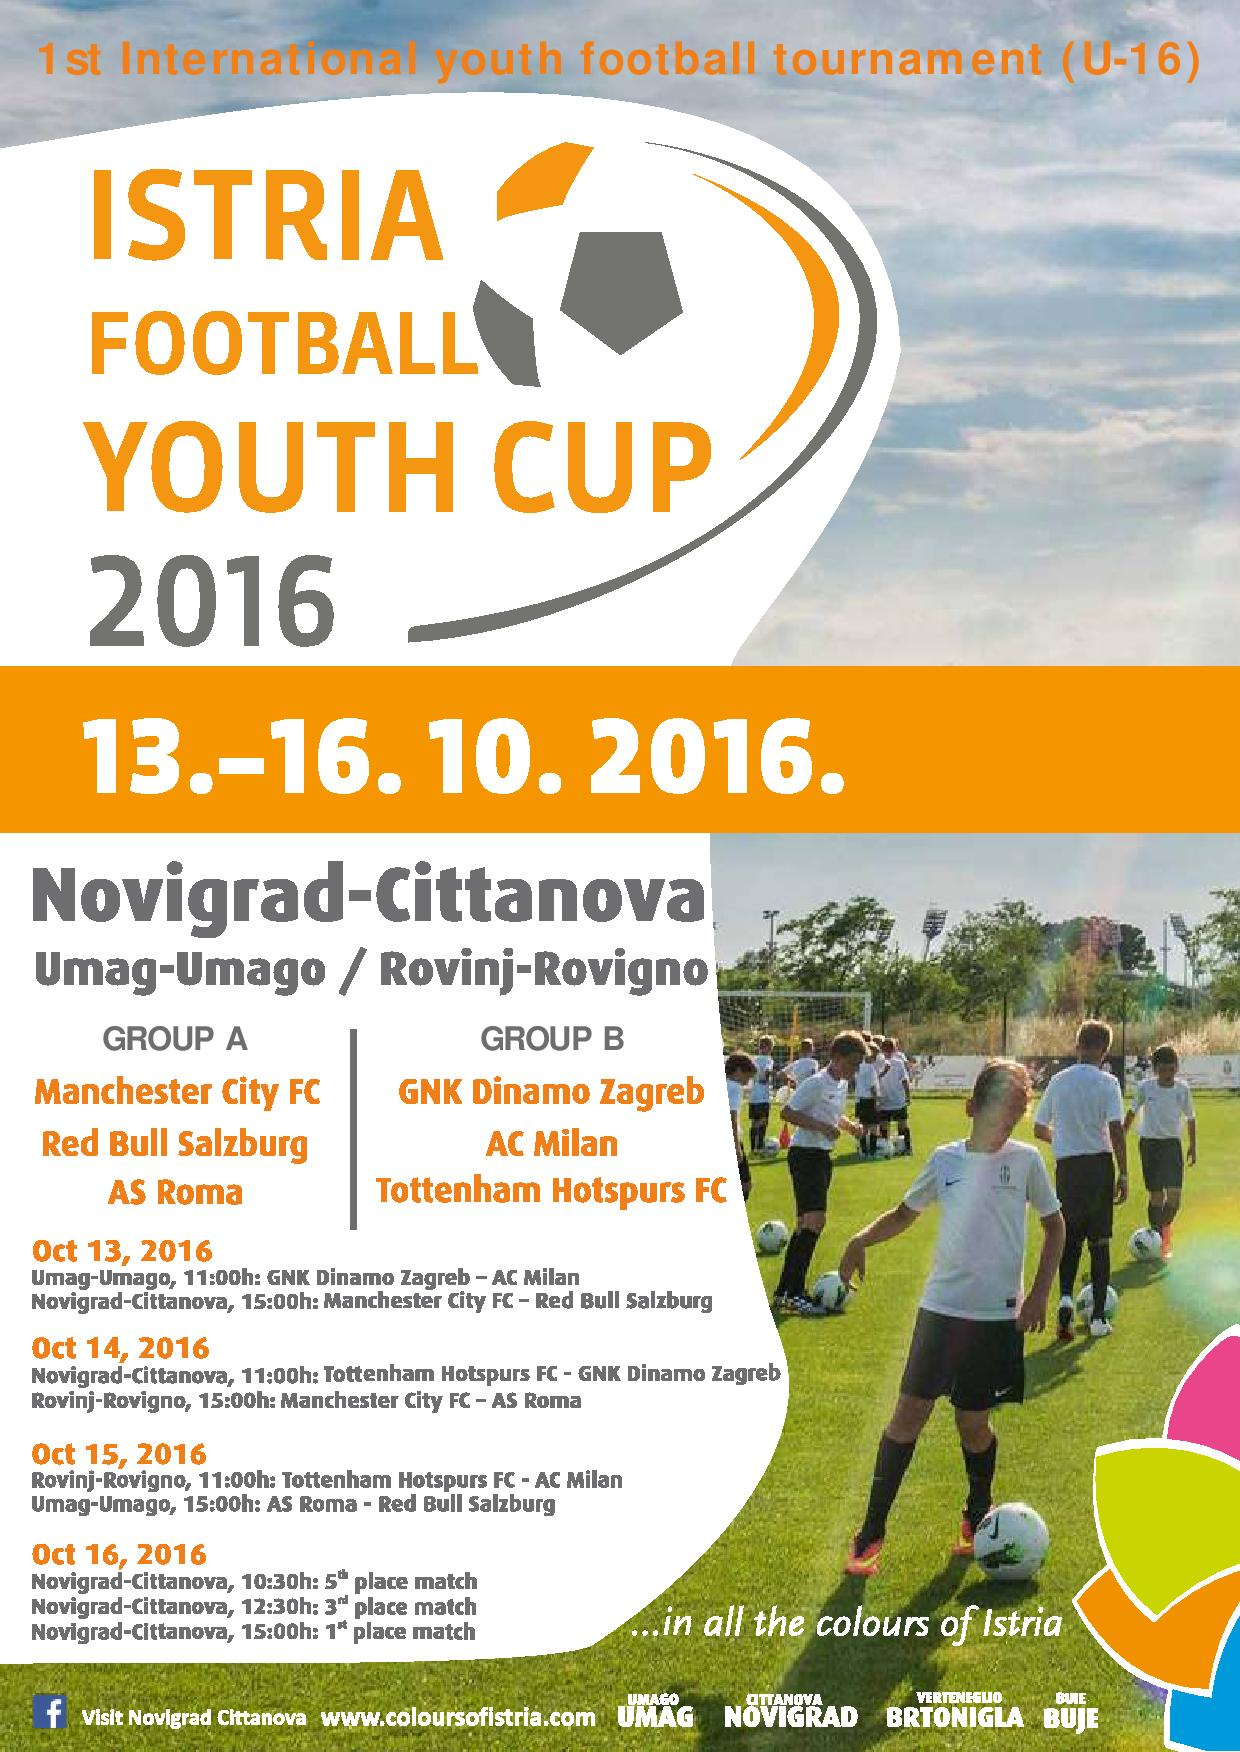 http://www.novigrad.hr/meunarodni_nogometni_turnir_u16_istria_football_youth_cup_13_16.10.2016